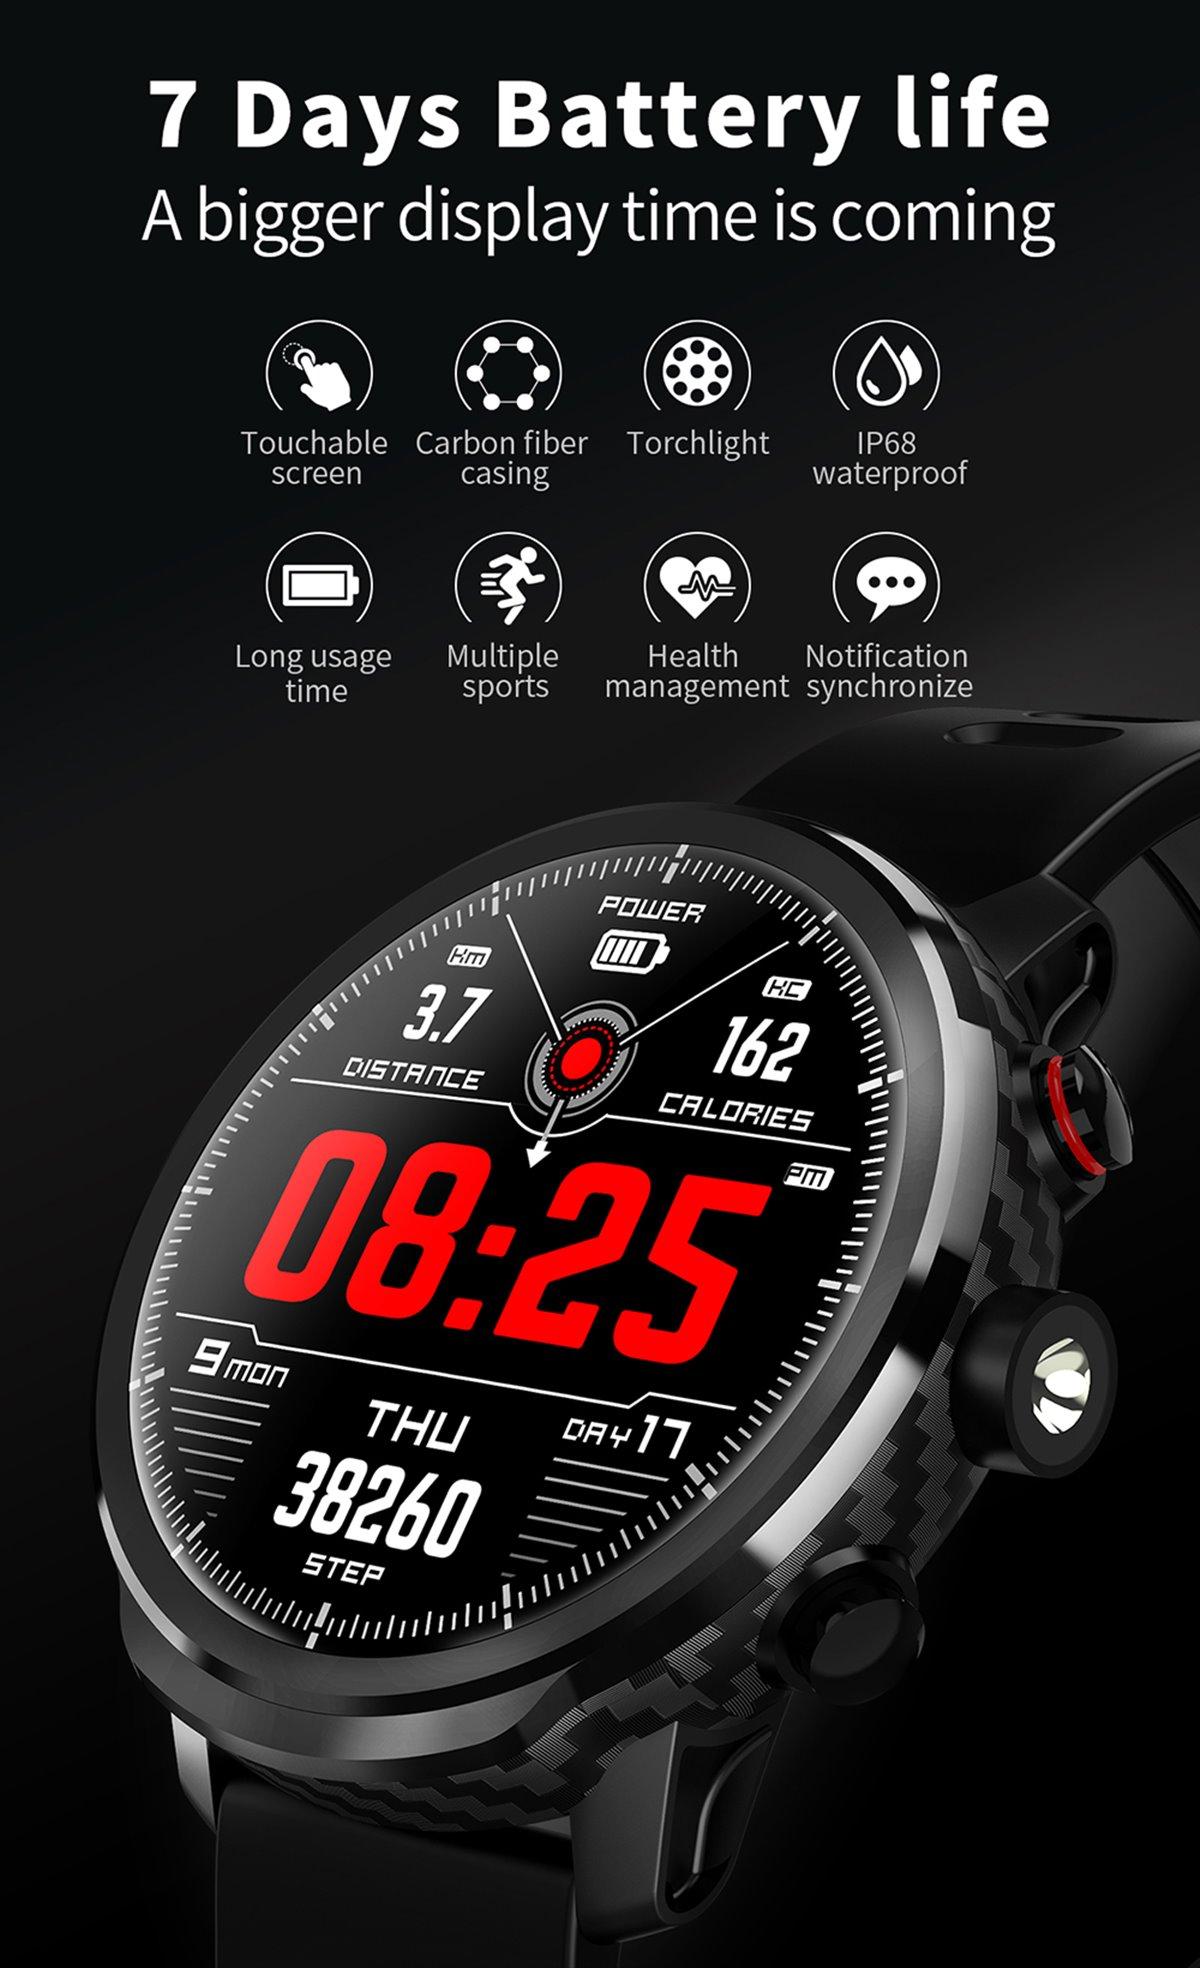 Lemfo L5 Akıllı Saat Karbon Fiber Kasa 100 Gün Pil Ömrü